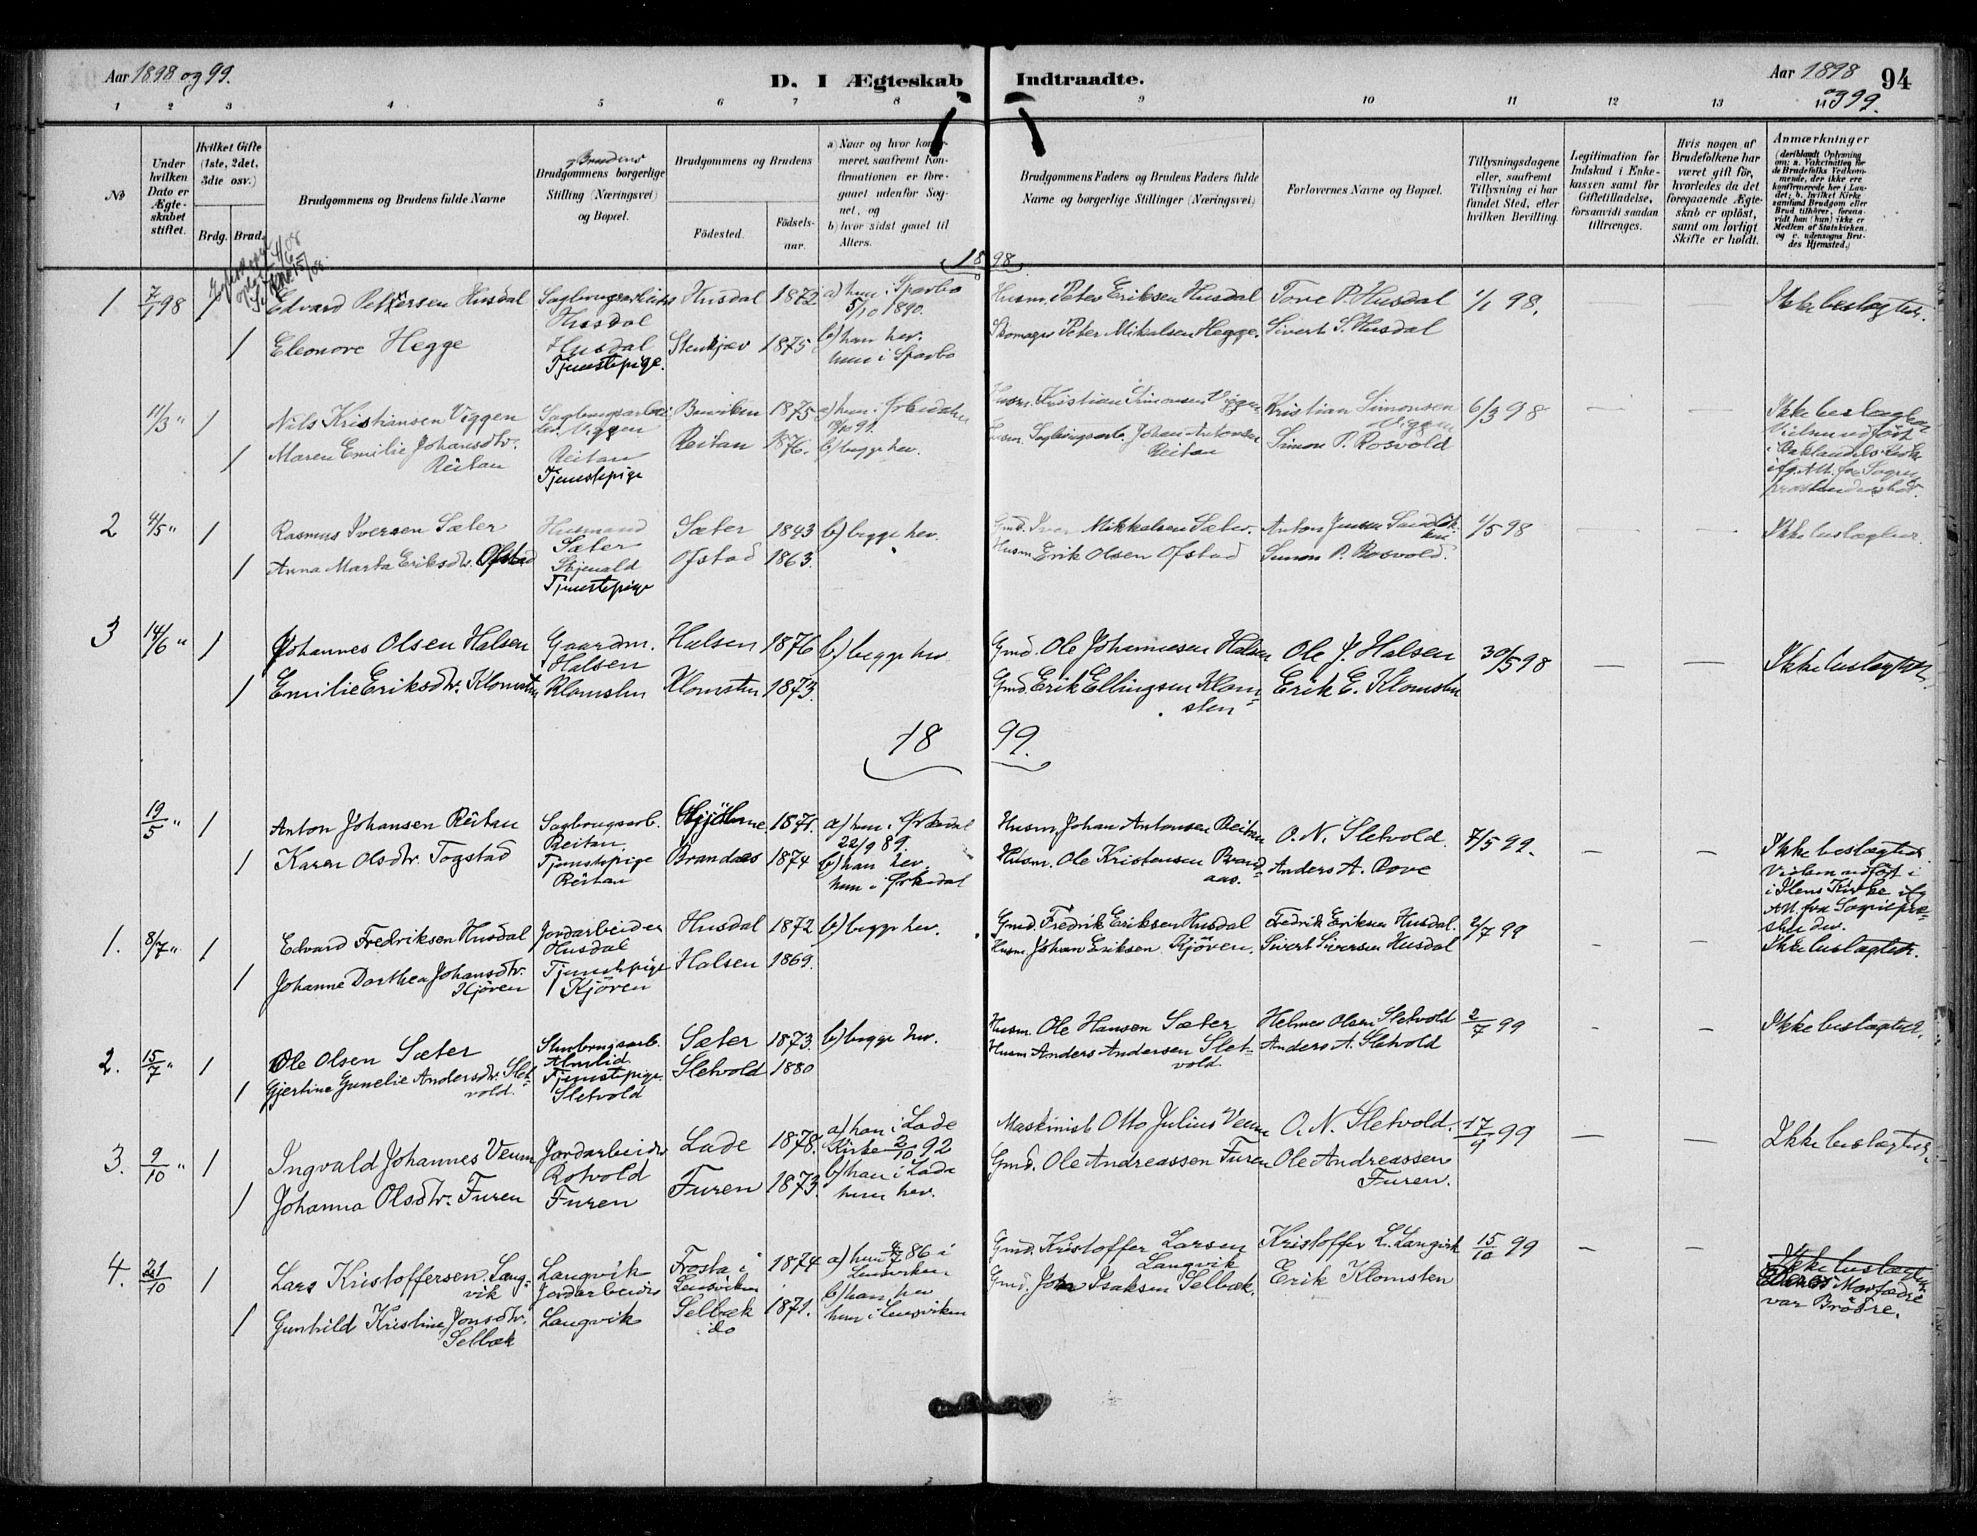 SAT, Ministerialprotokoller, klokkerbøker og fødselsregistre - Sør-Trøndelag, 670/L0836: Parish register (official) no. 670A01, 1879-1904, p. 94